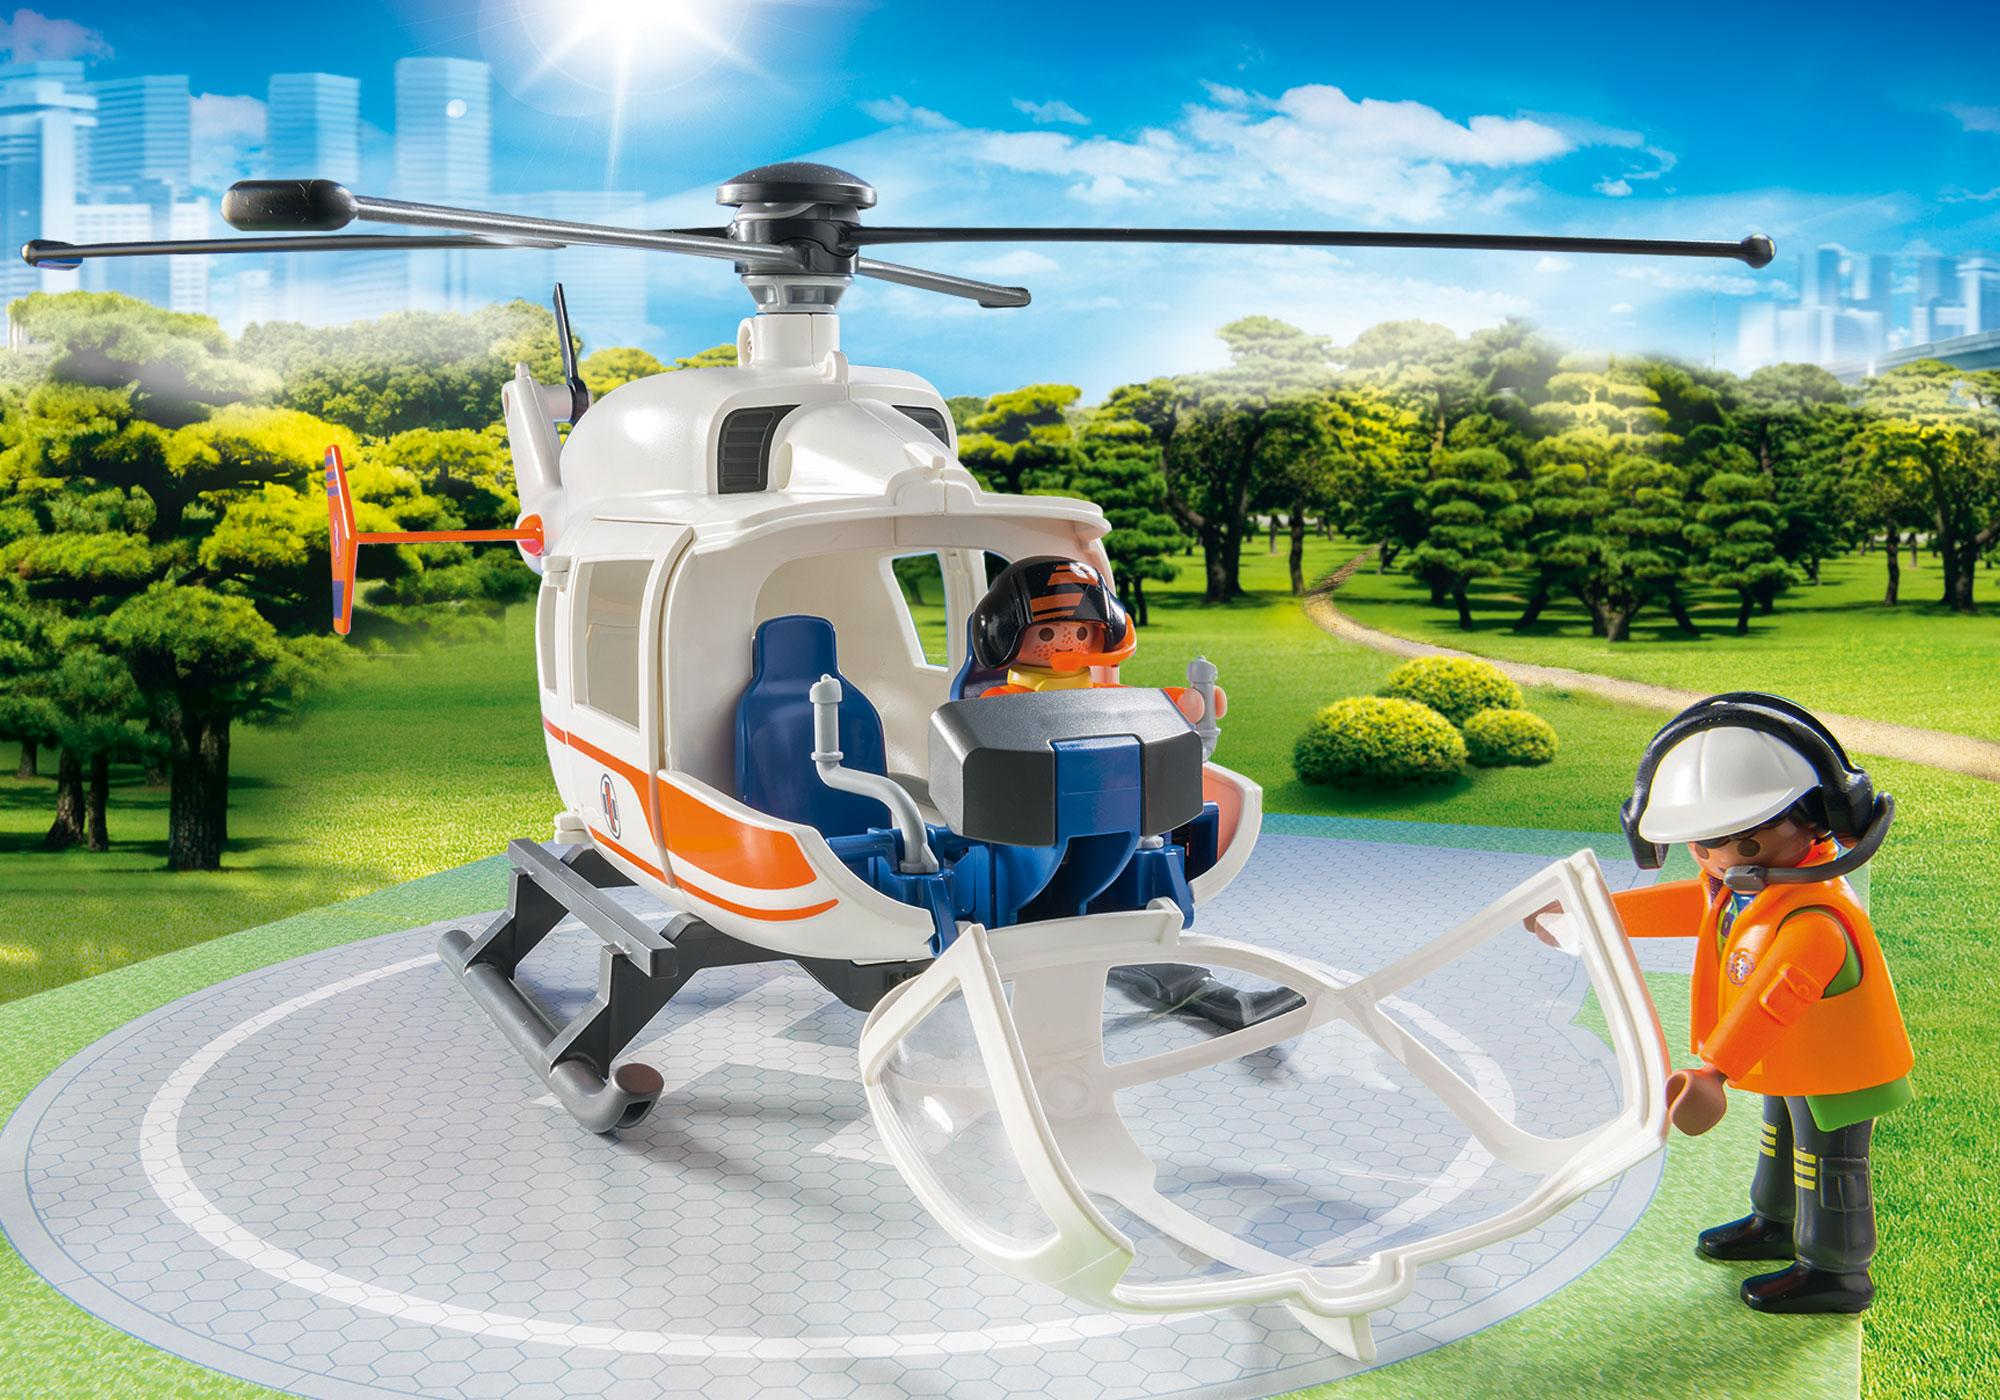 http://media.playmobil.com/i/playmobil/70048_product_extra1/Rettungshelikopter